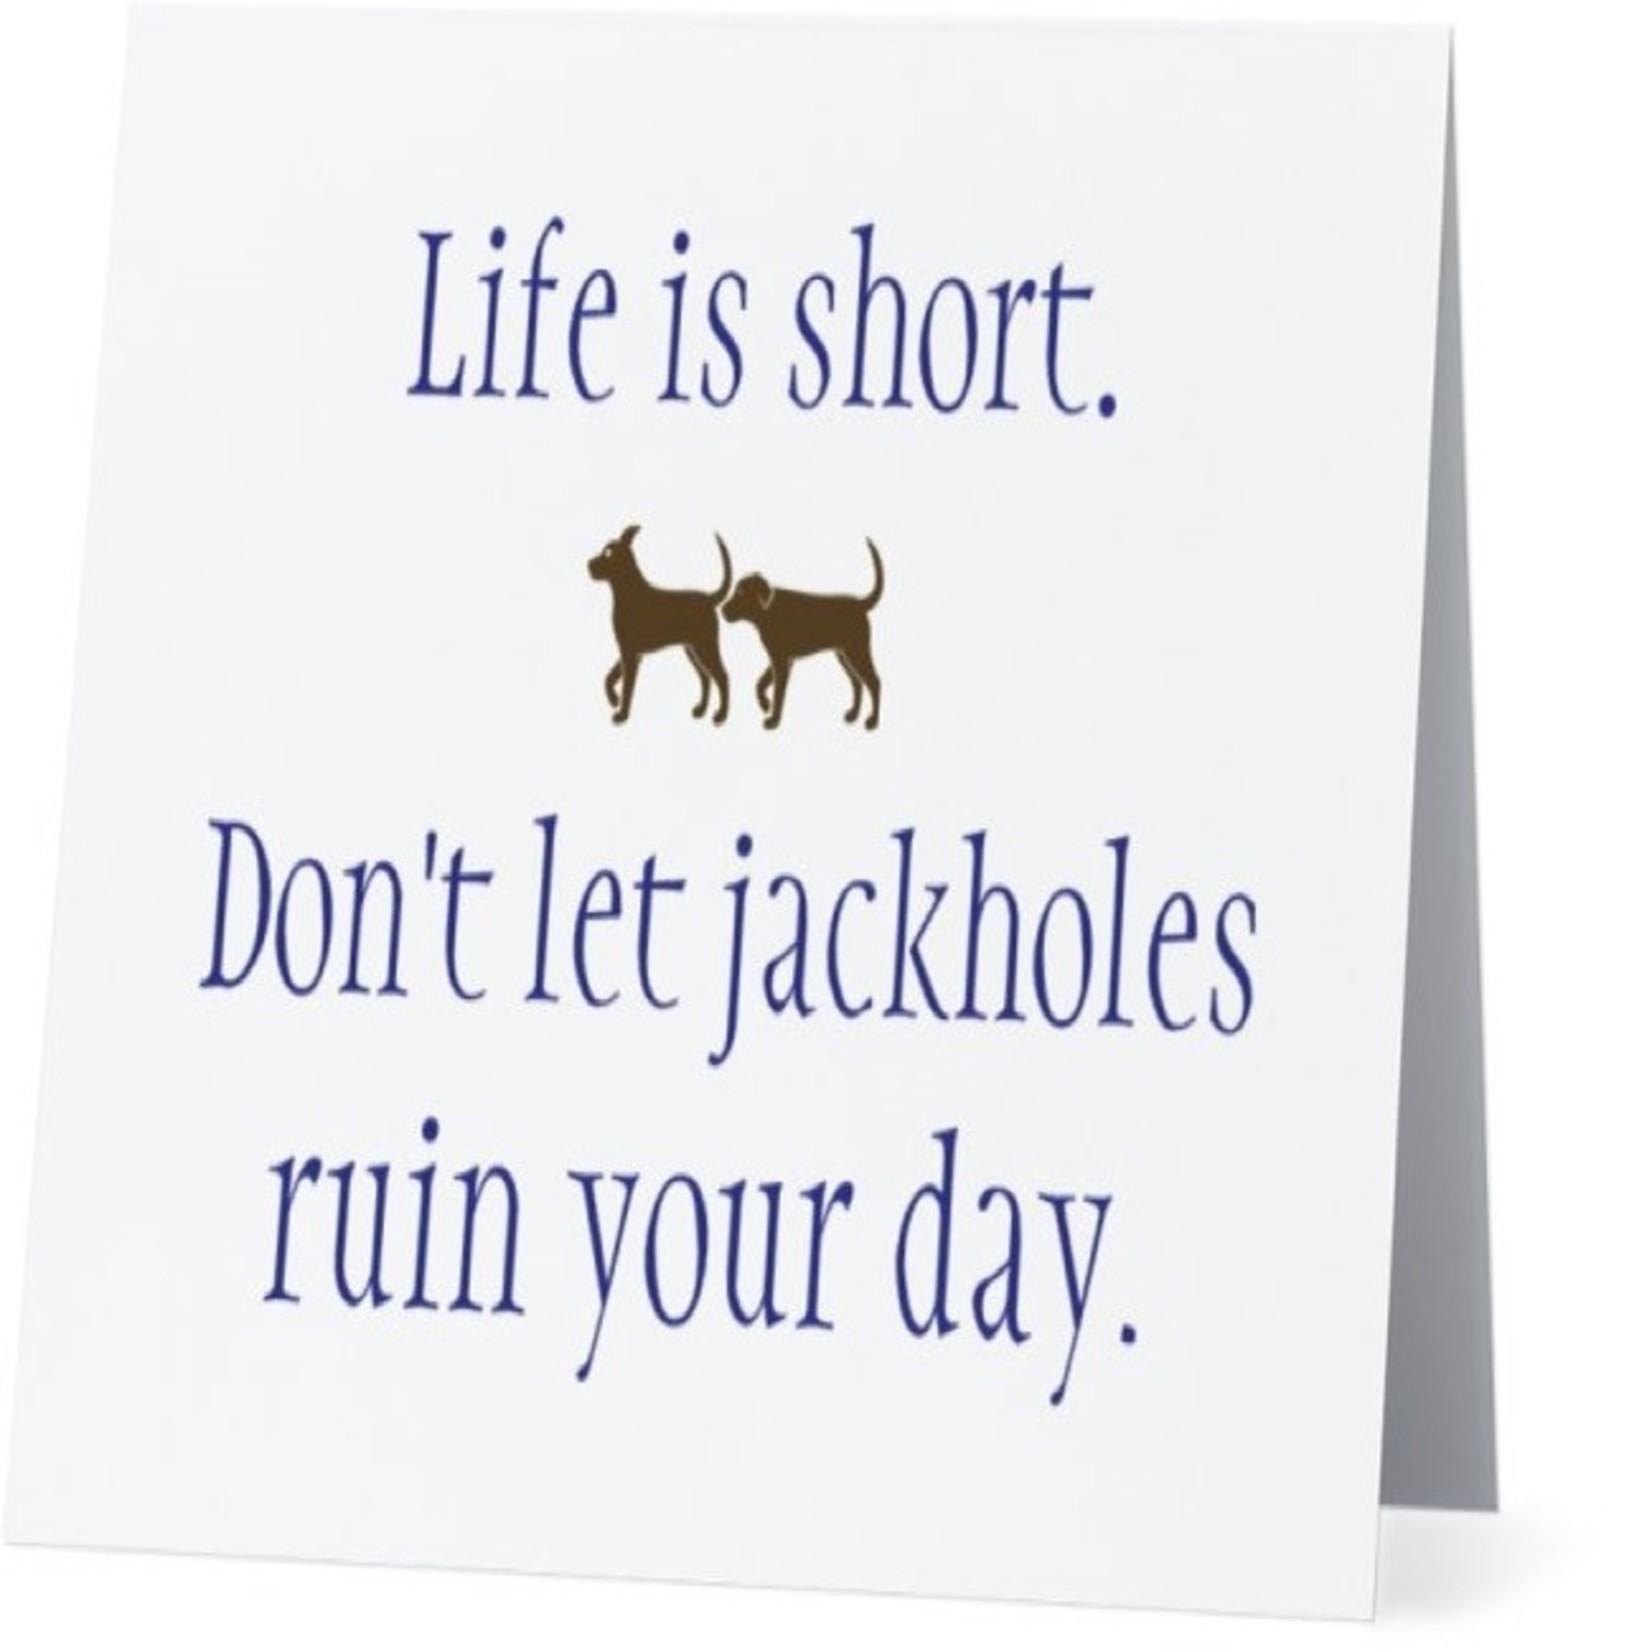 Bad Annie's Card #019 - Dont Let Jackholes Ruin Your Day